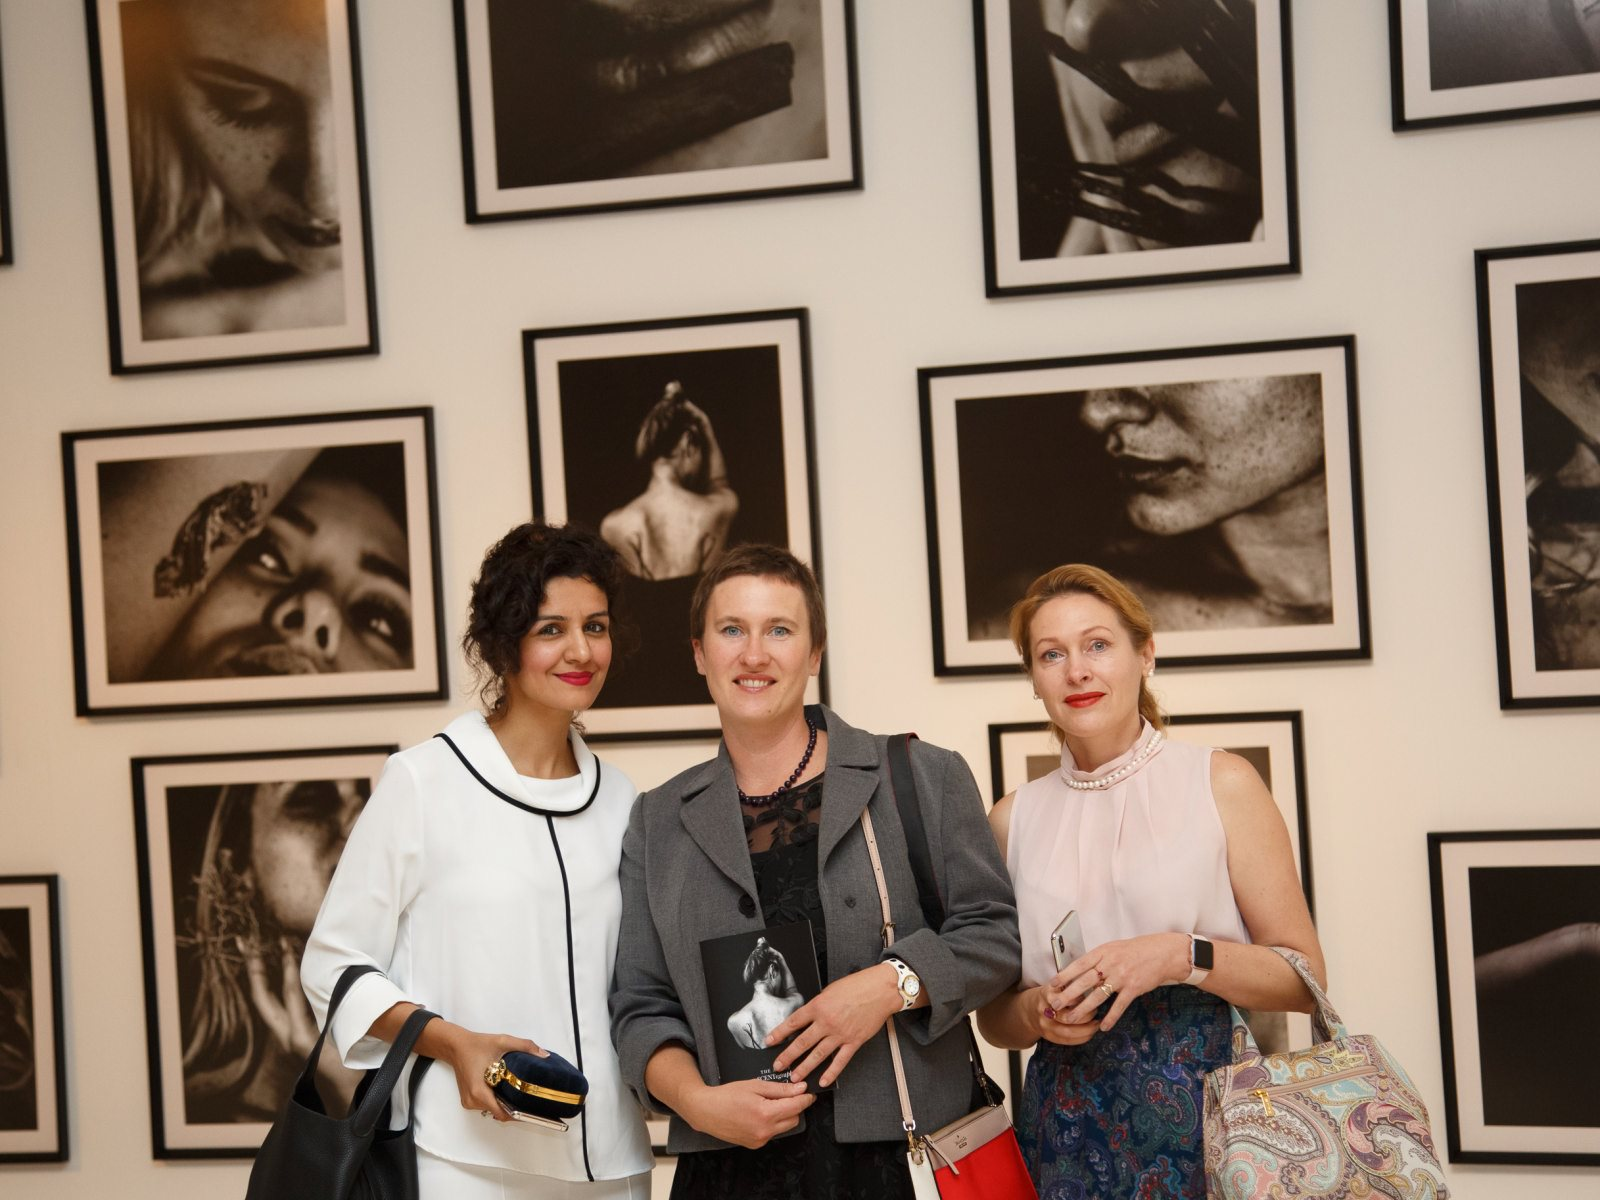 Samreen Shah, Elena and Svetlana with photos on background